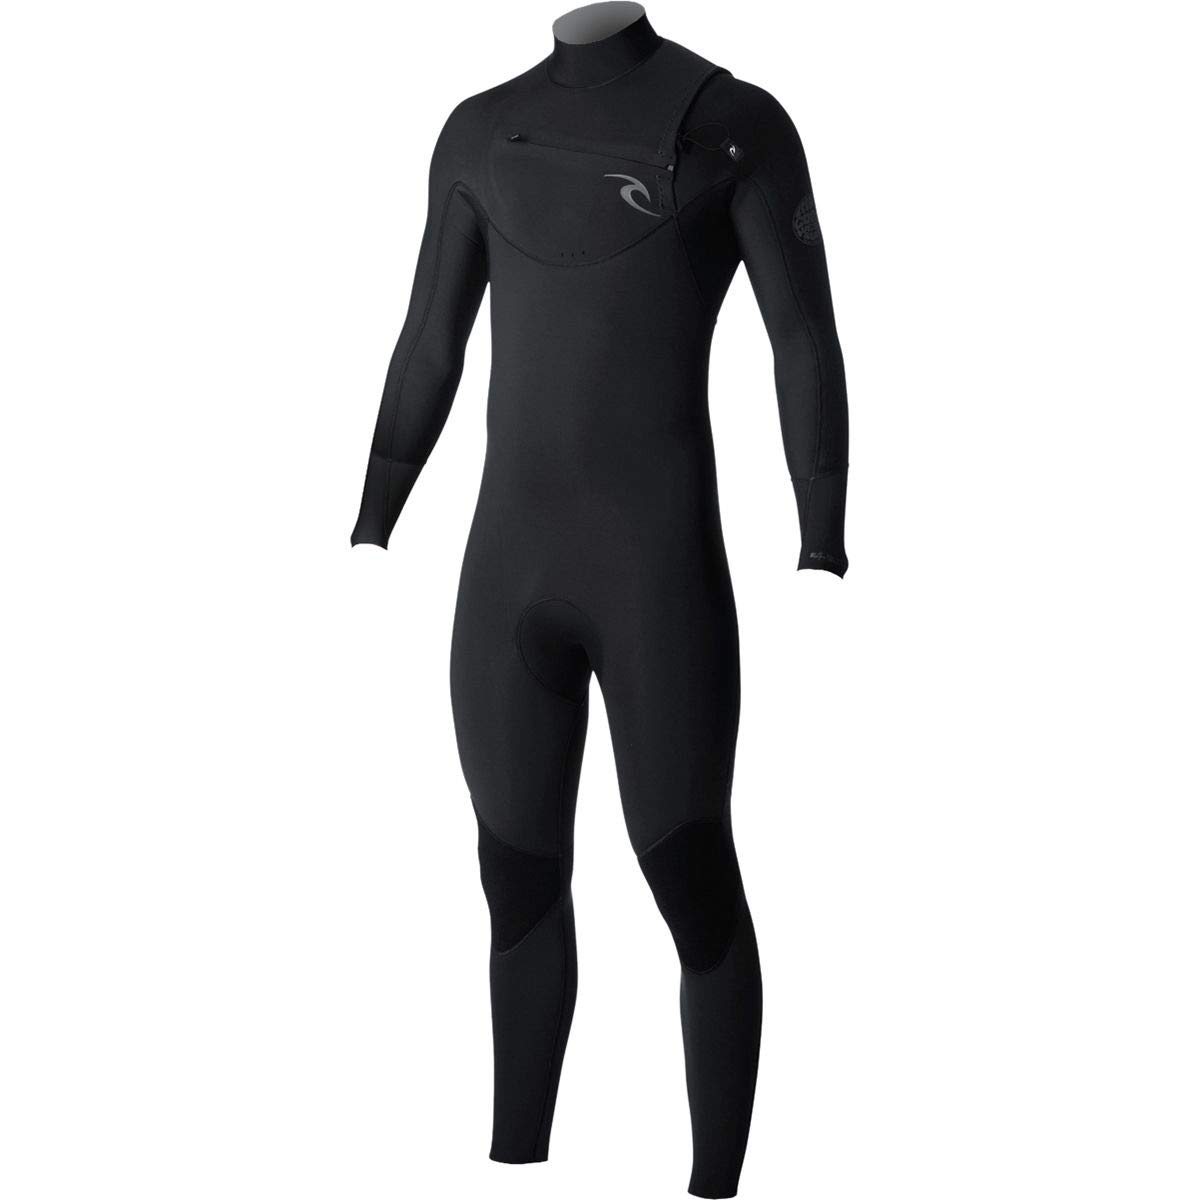 Rip Curl Dawn Patrol Chest Zip 4/3 Wetsuit, Black, Small/Tall